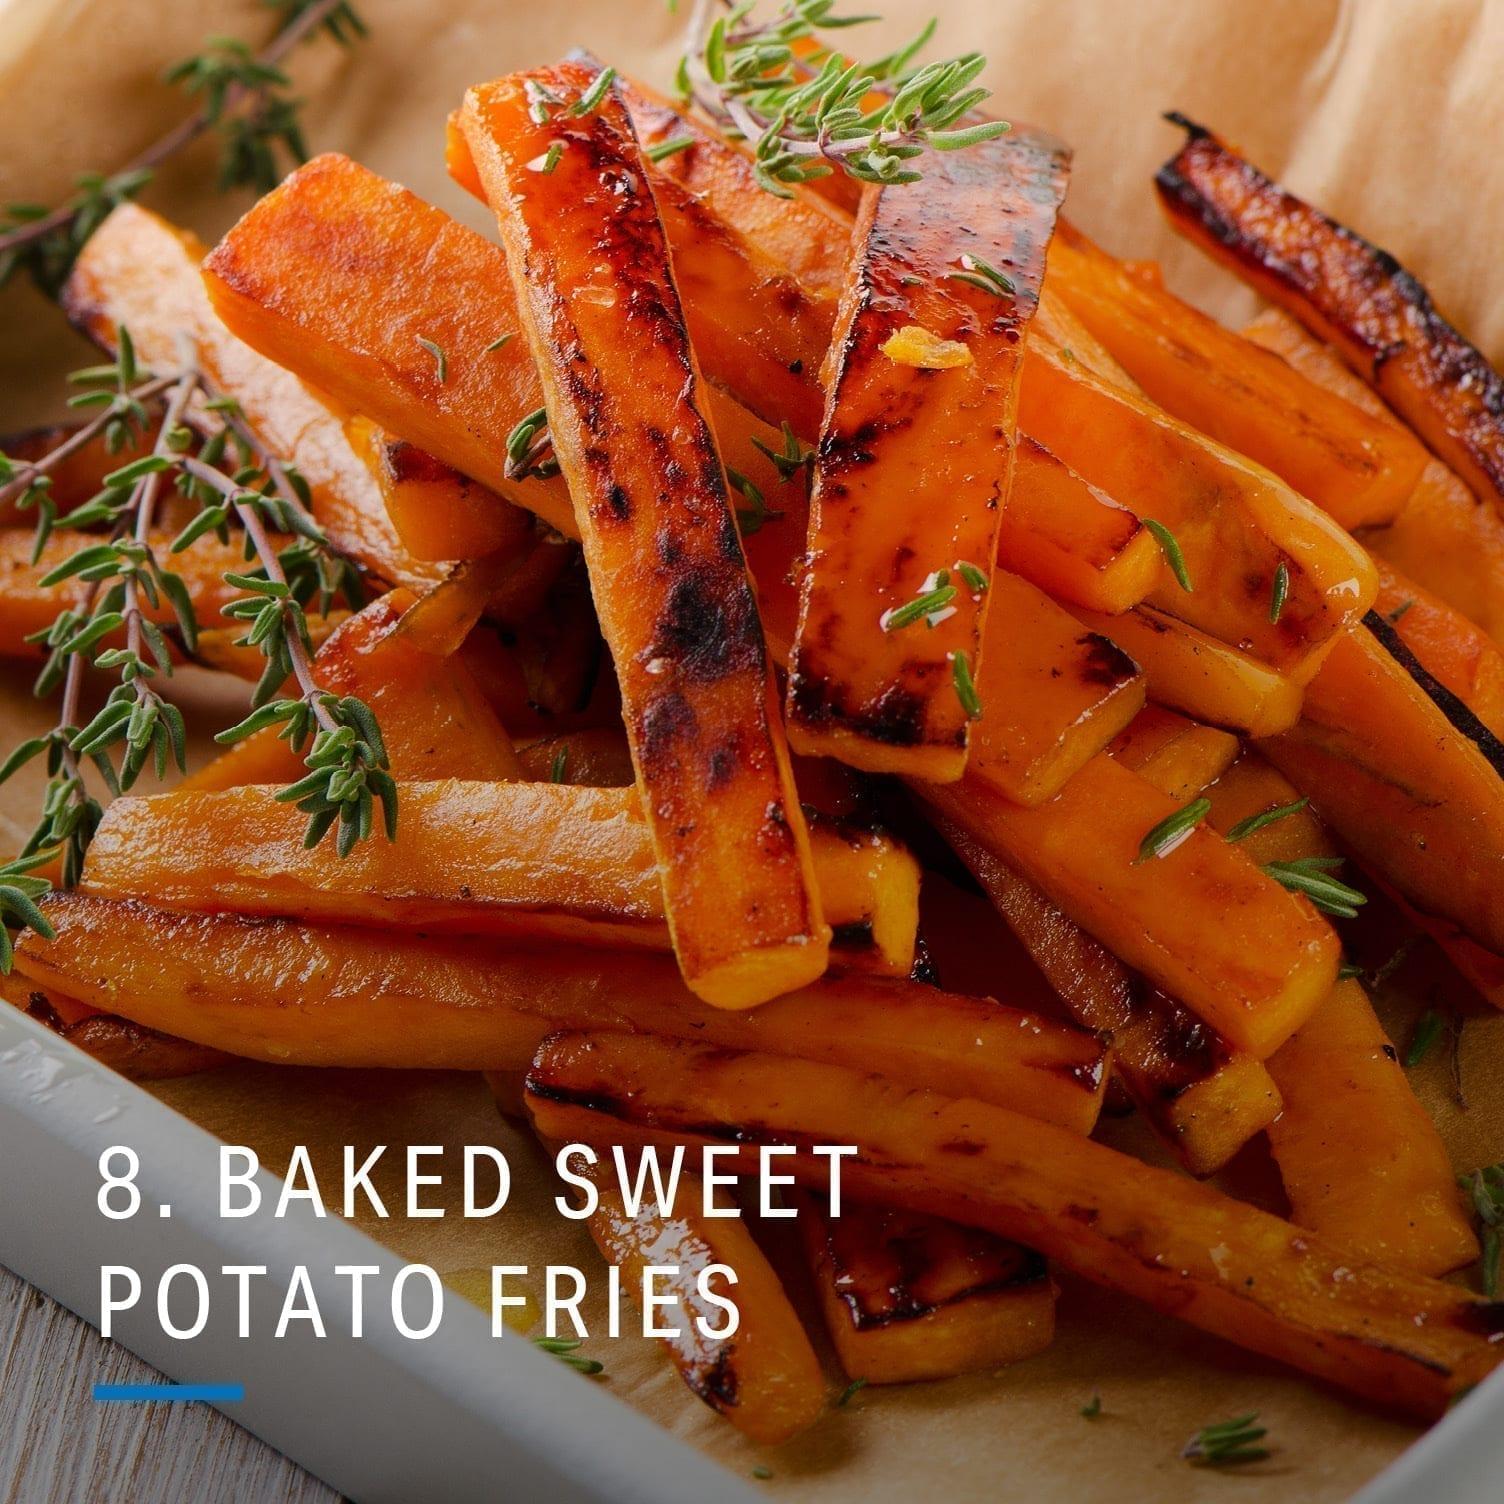 10 Foods to Curb Salty Cravings